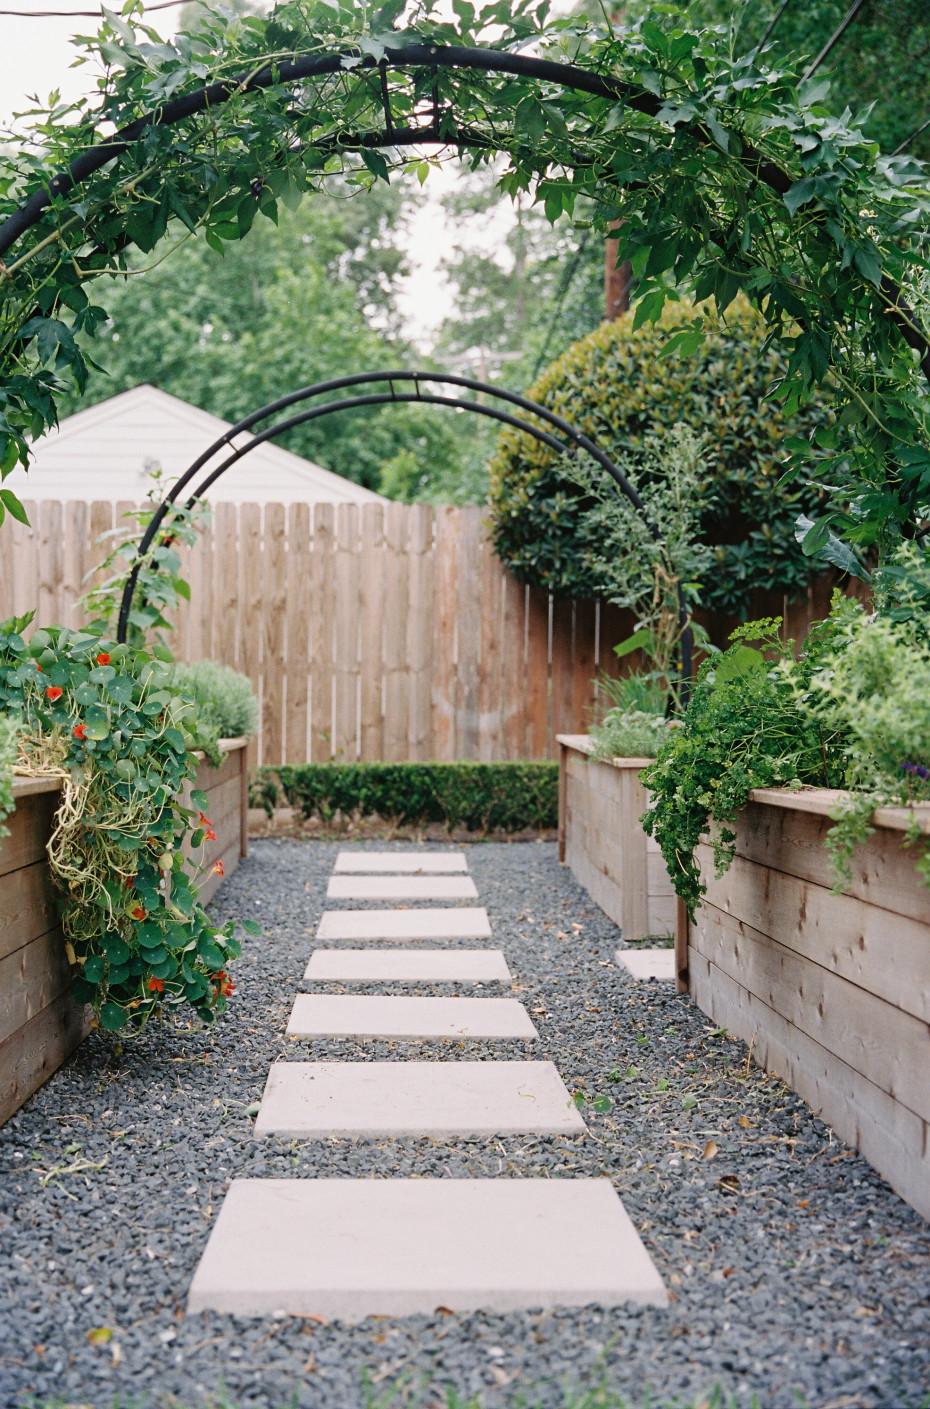 Arch Garden Trellis Ideas from Nicole Burke of Gardenary